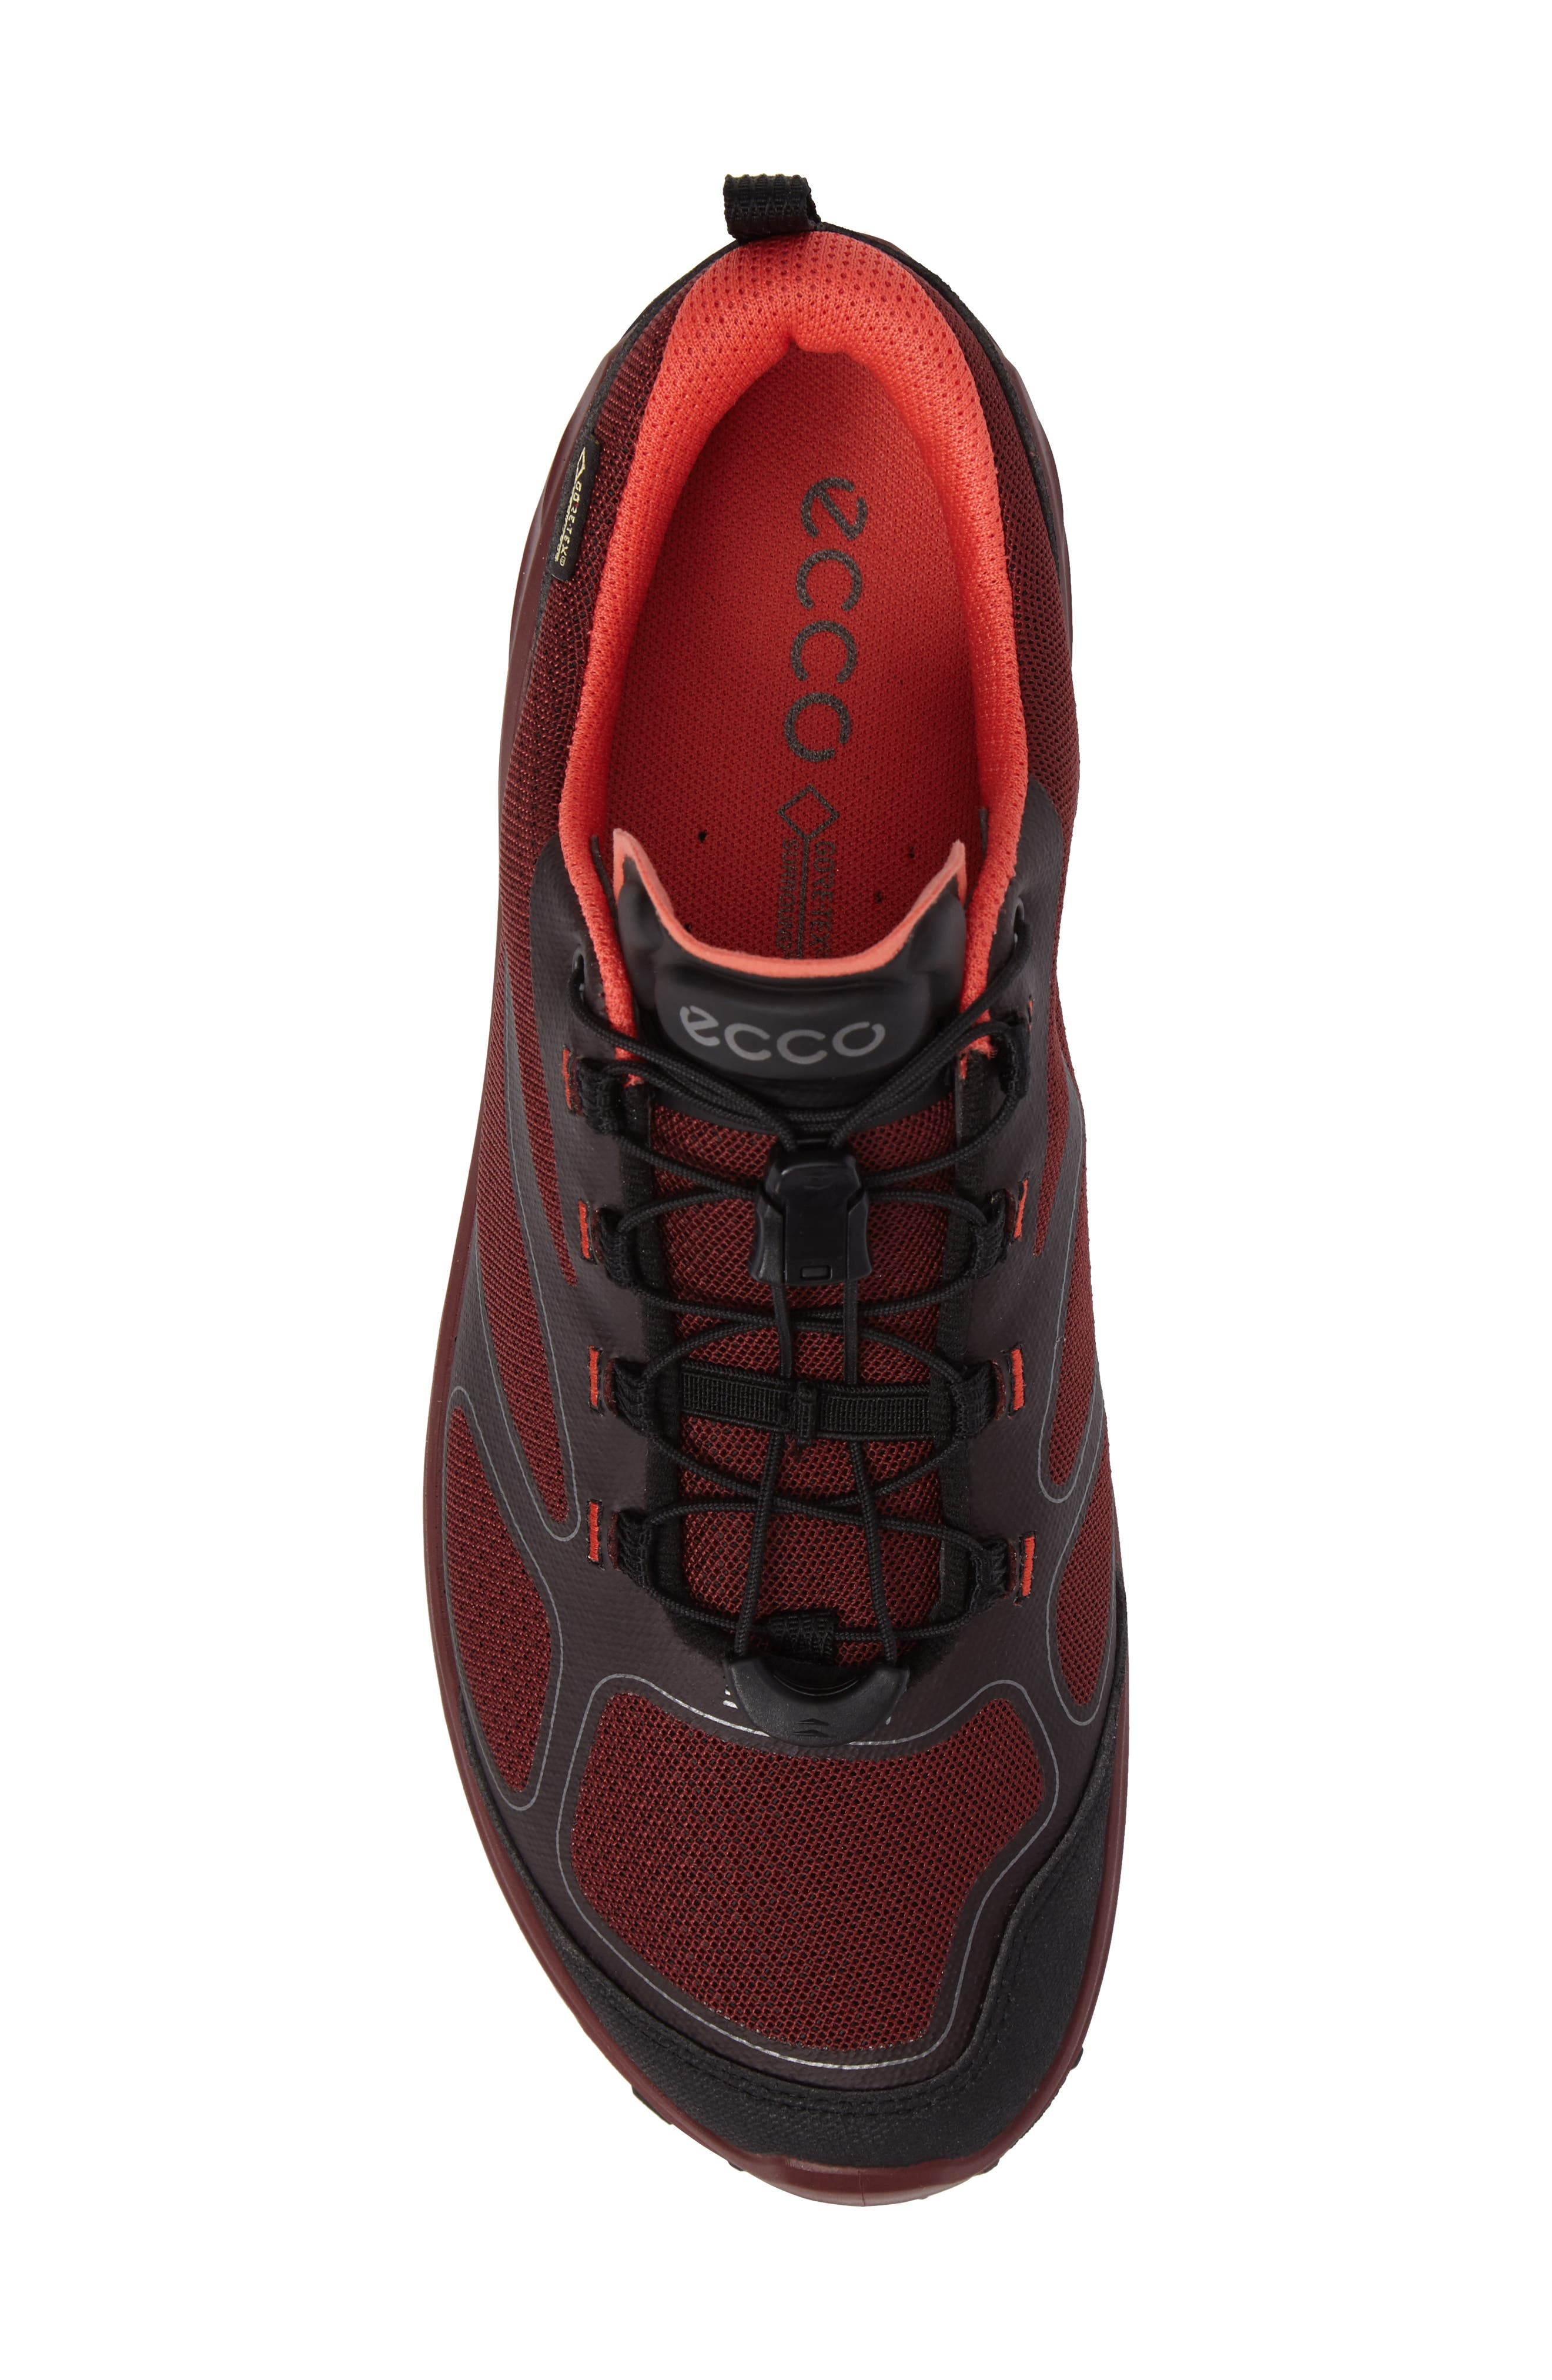 BIOM Venture GTX Sneaker,                             Alternate thumbnail 5, color,                             Black/ Coral Blush Fabric